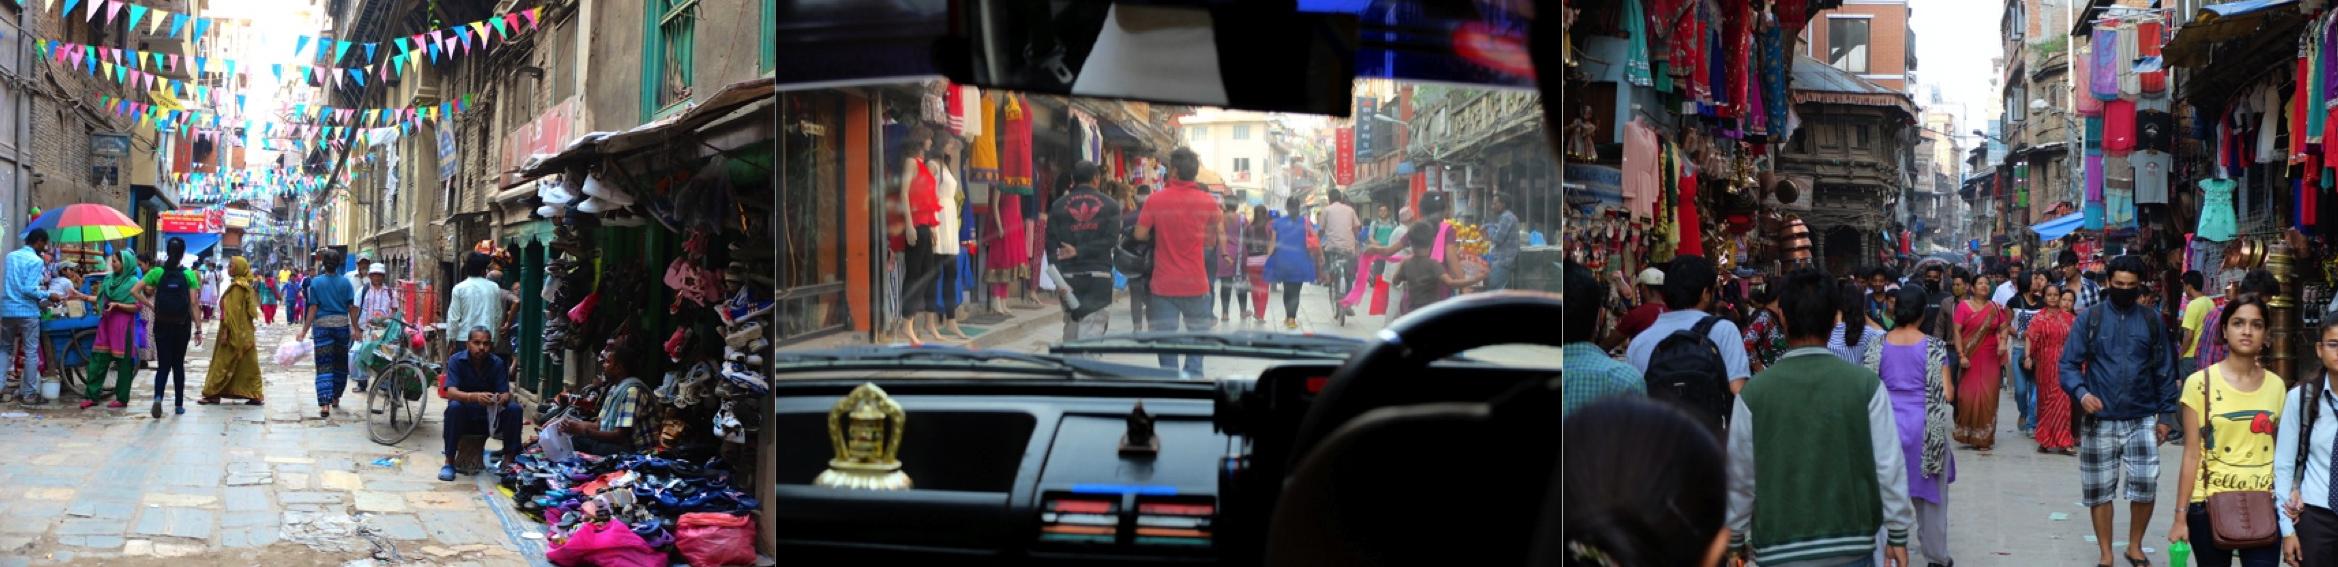 Les rues de Kathmandu